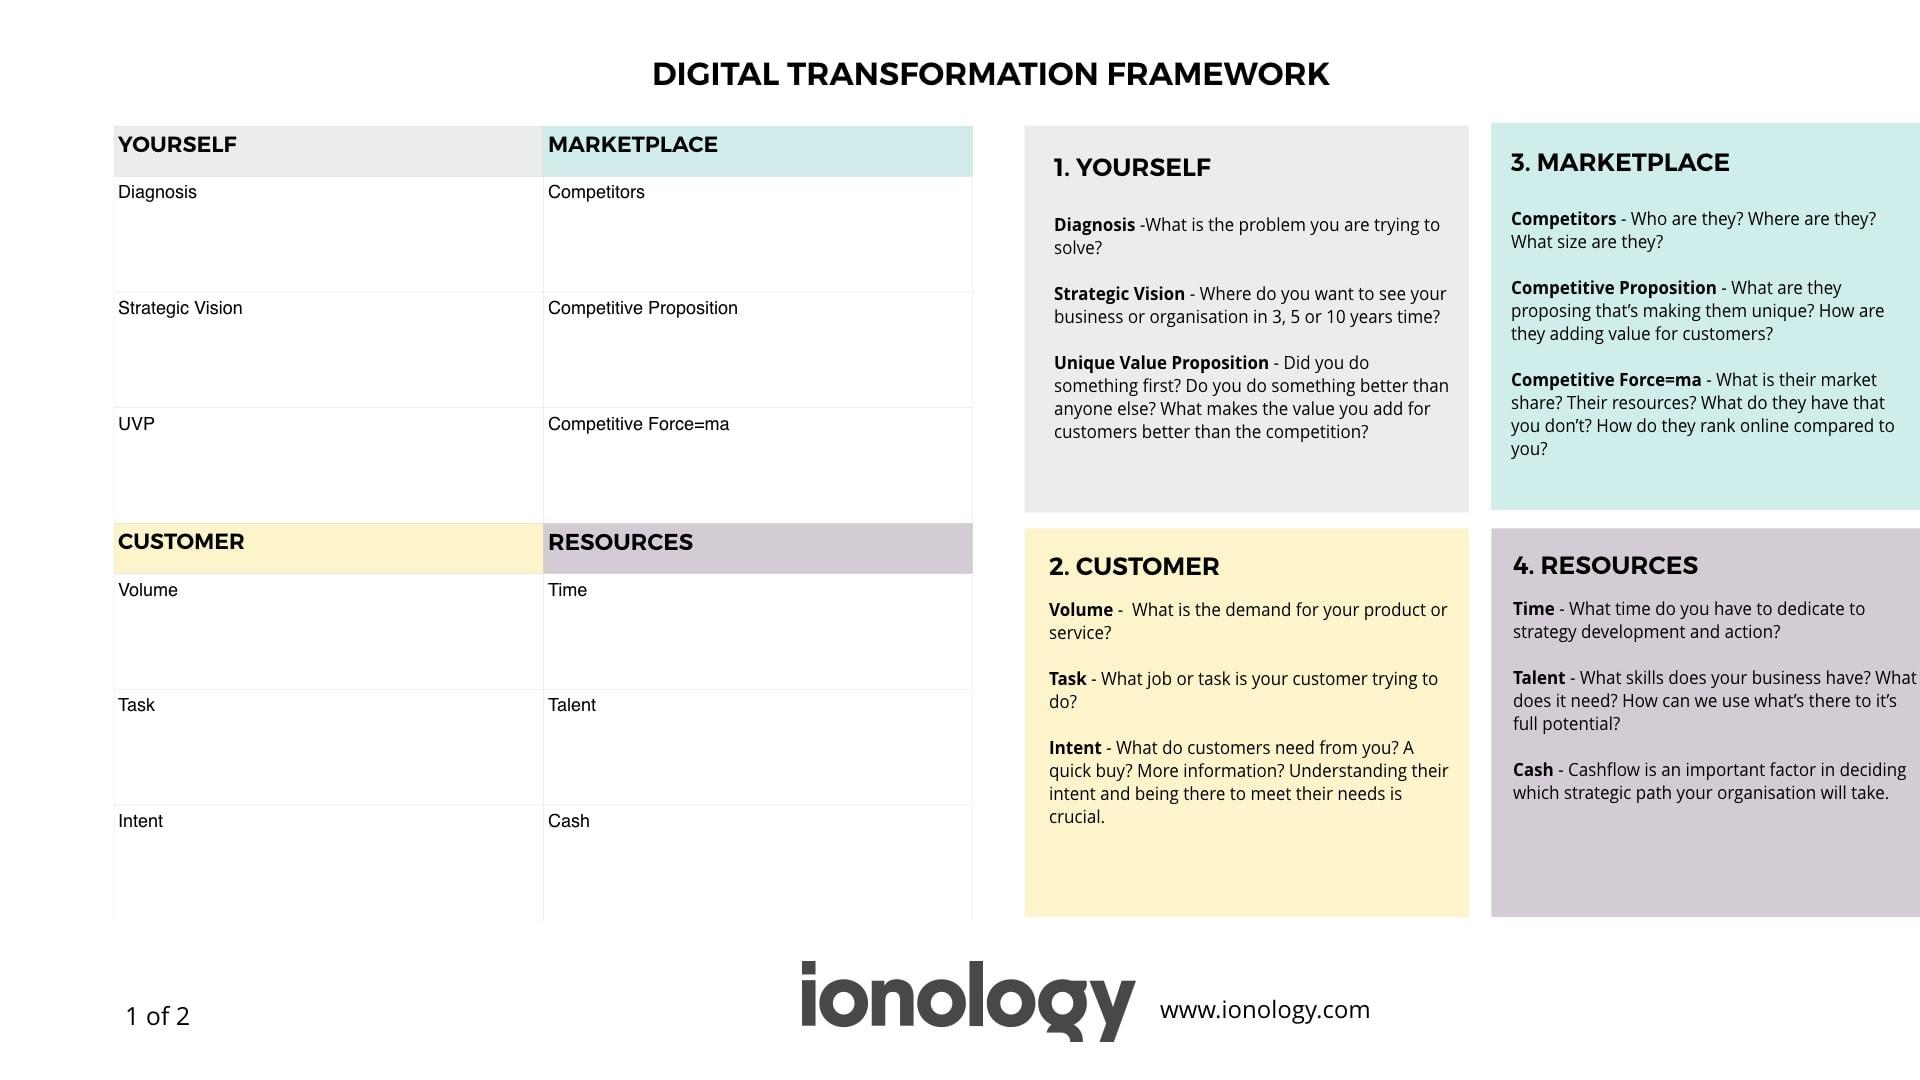 Ionology Digital Transformation Framework - Part 1 of 2